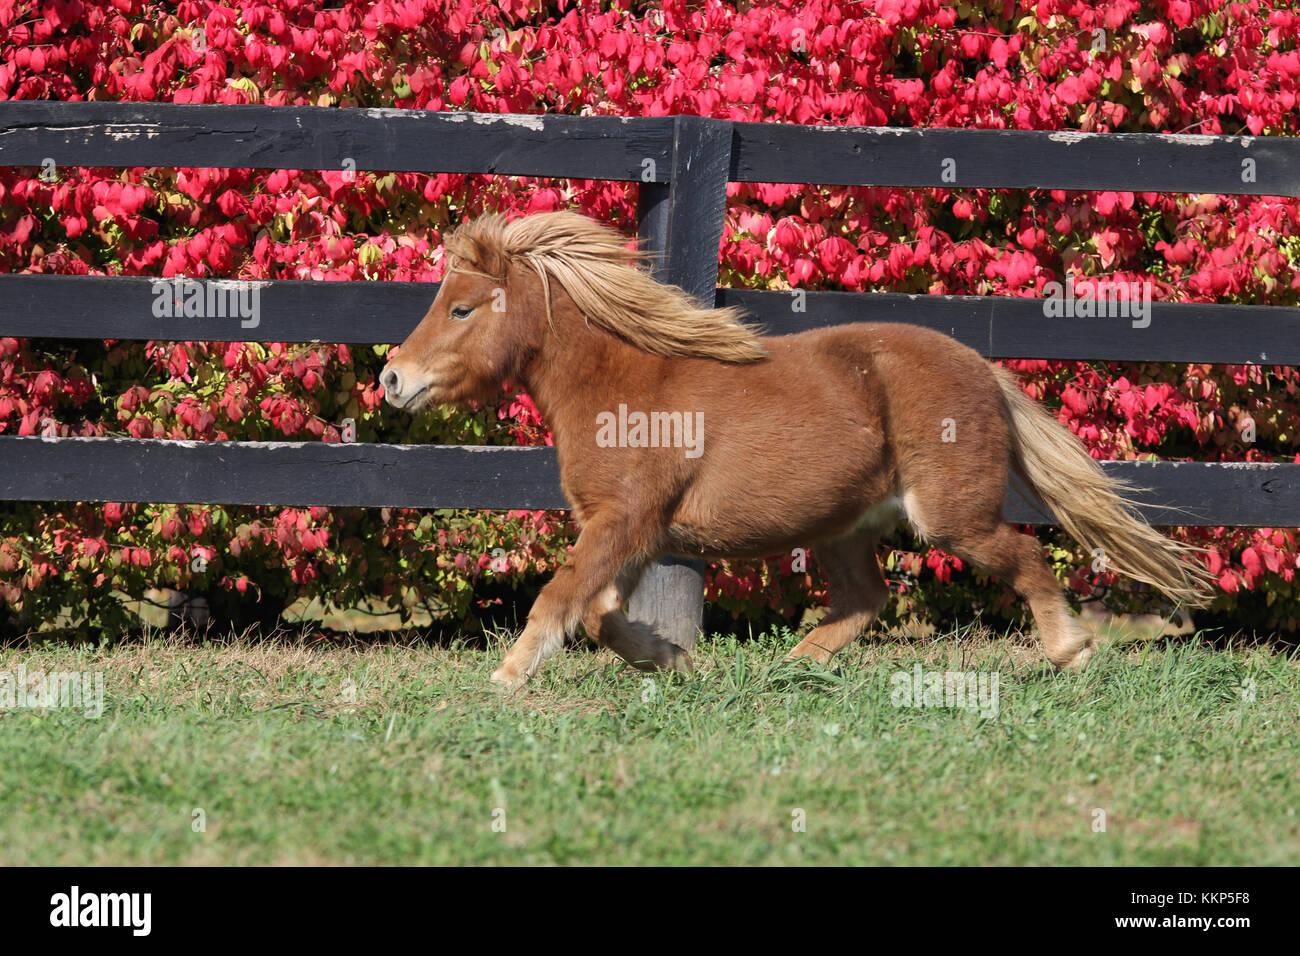 Miniature Pony - Stock Image